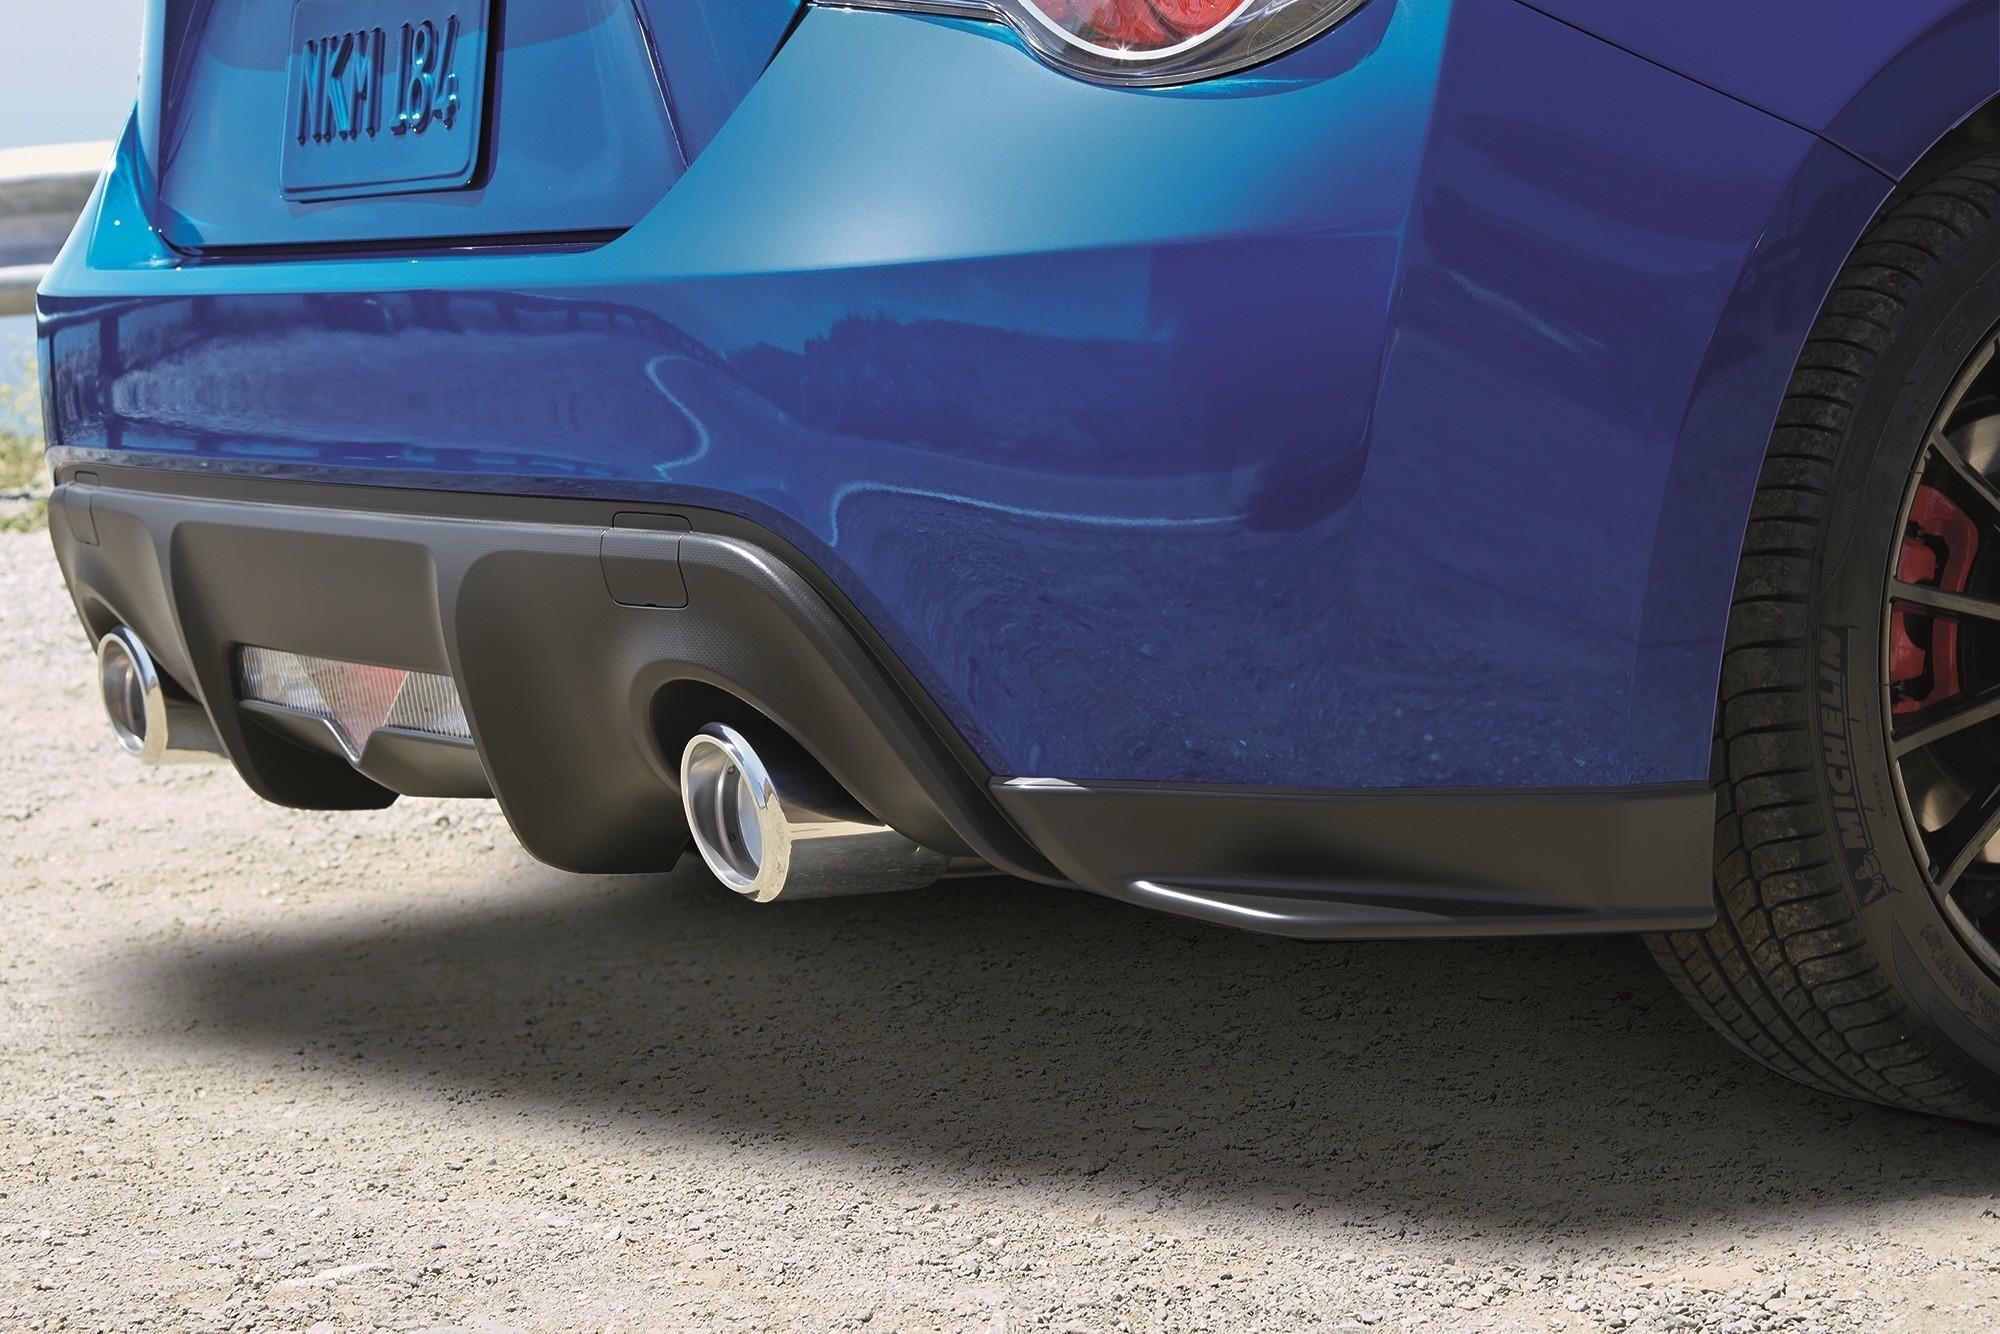 2015 Subaru Brz Series Blue Brings Sti Goodies